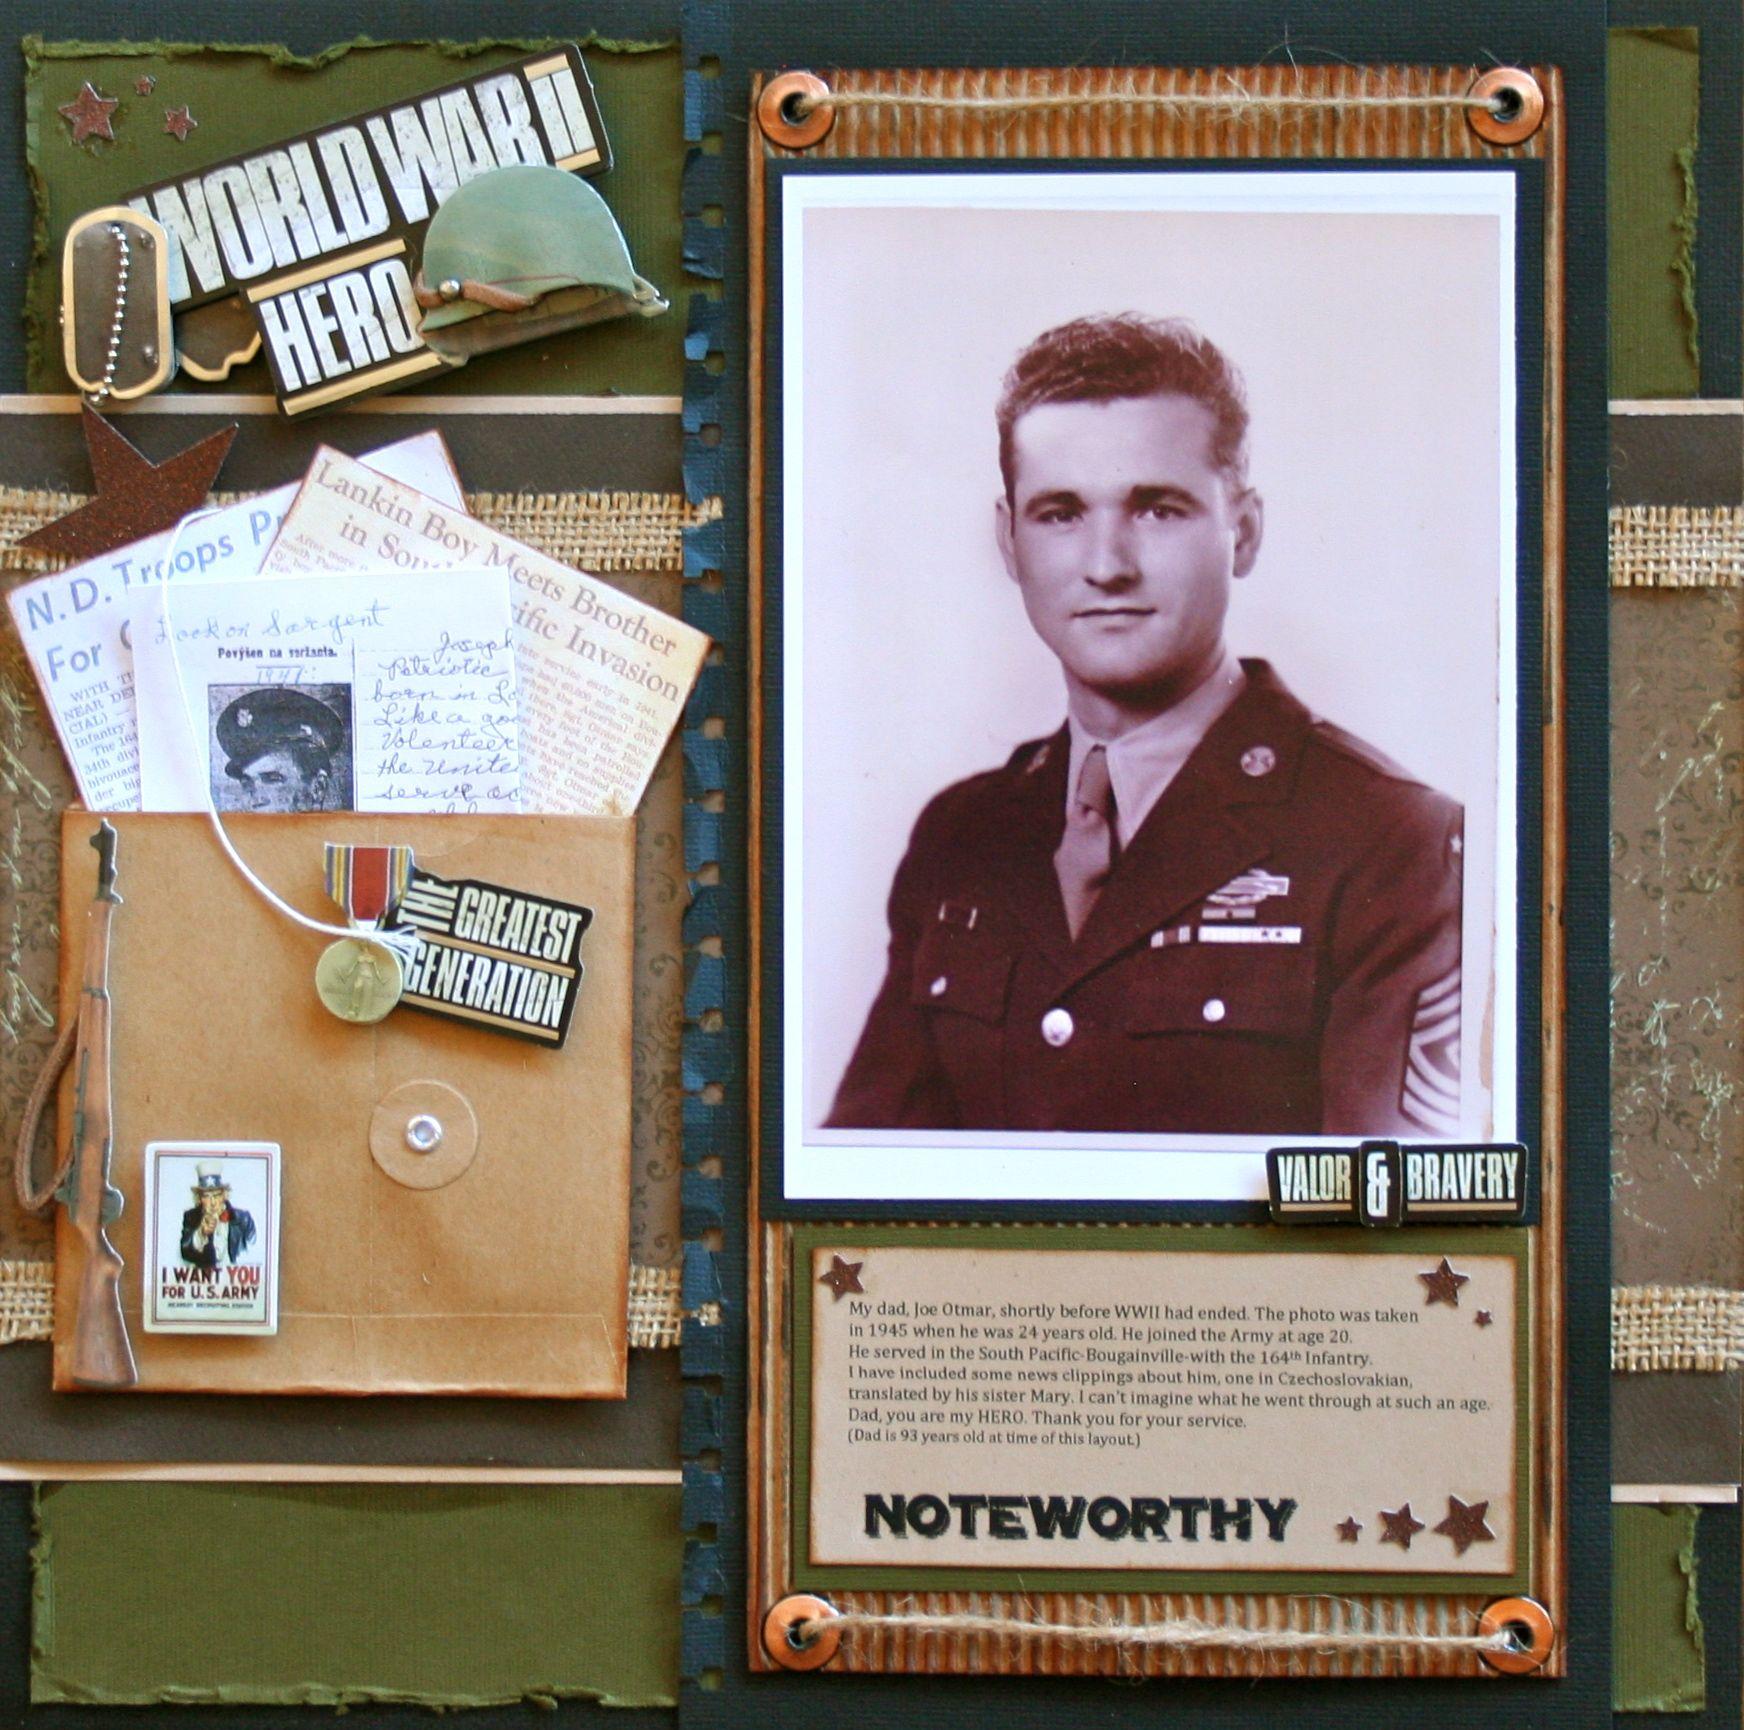 Family scrapbook ideas on pinterest - World War Ii Hero Scrapbook Com